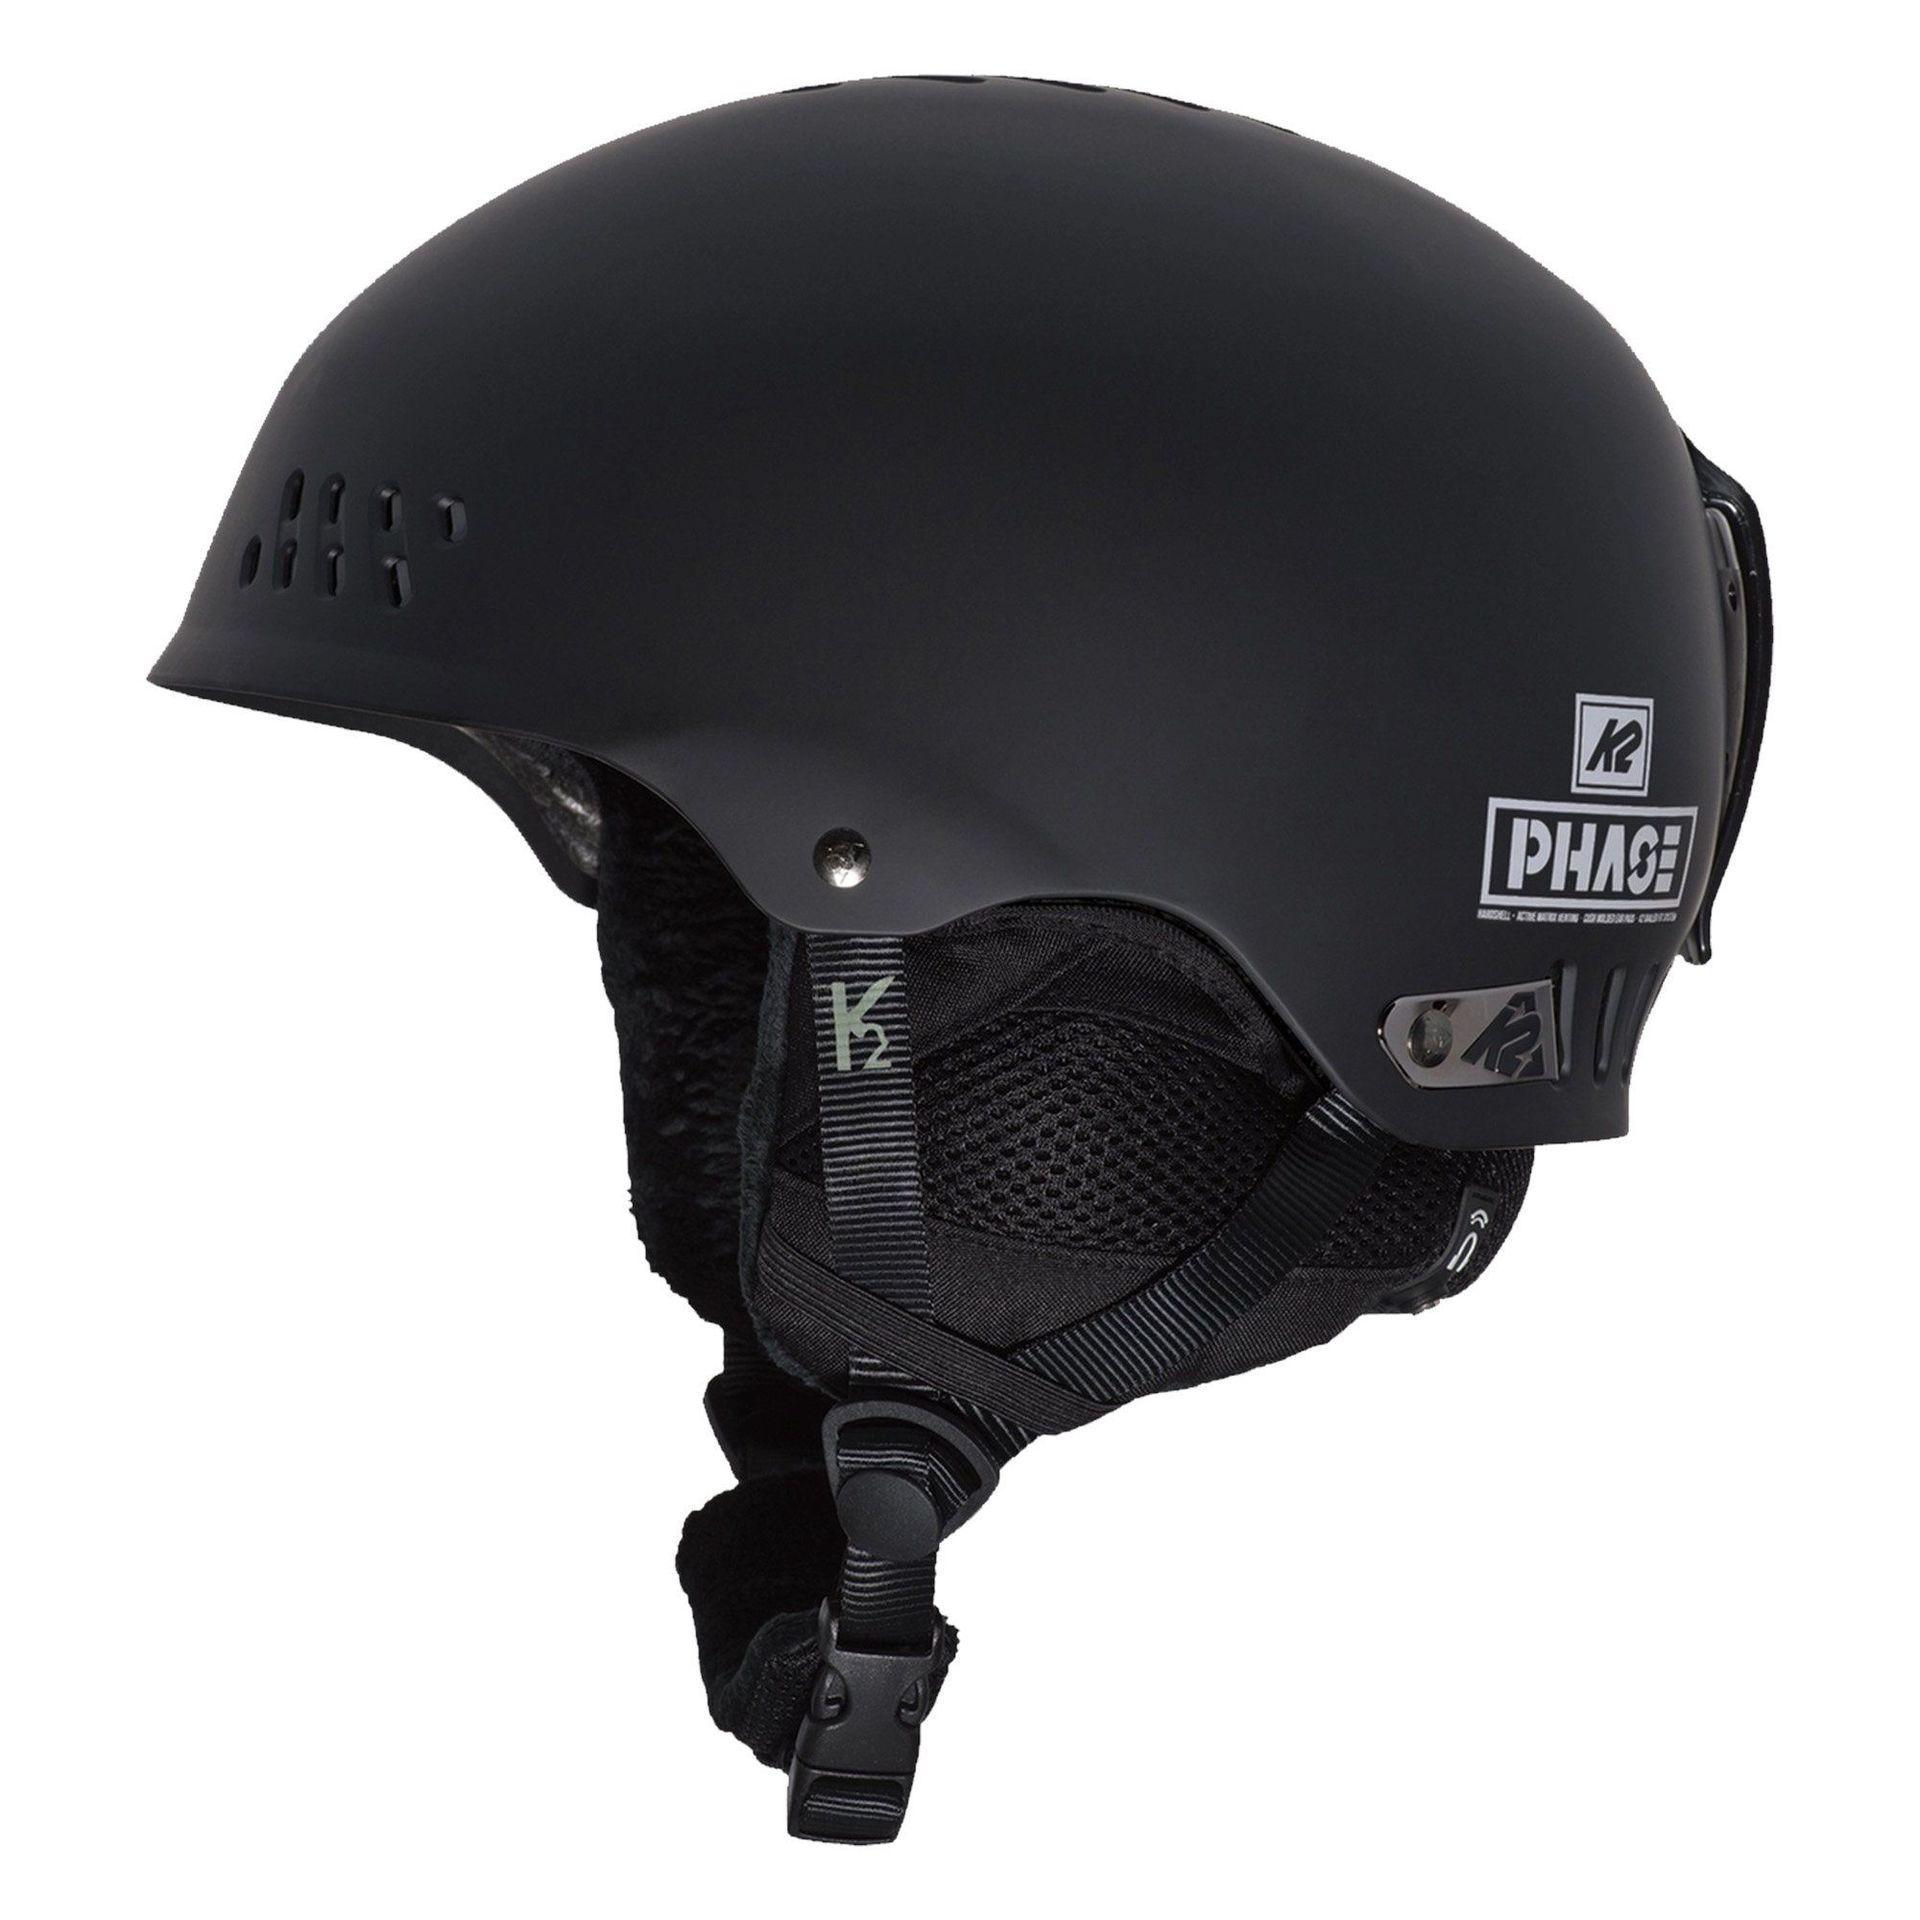 KASK K2 PHASE PRO 10B4000-31 BLACK